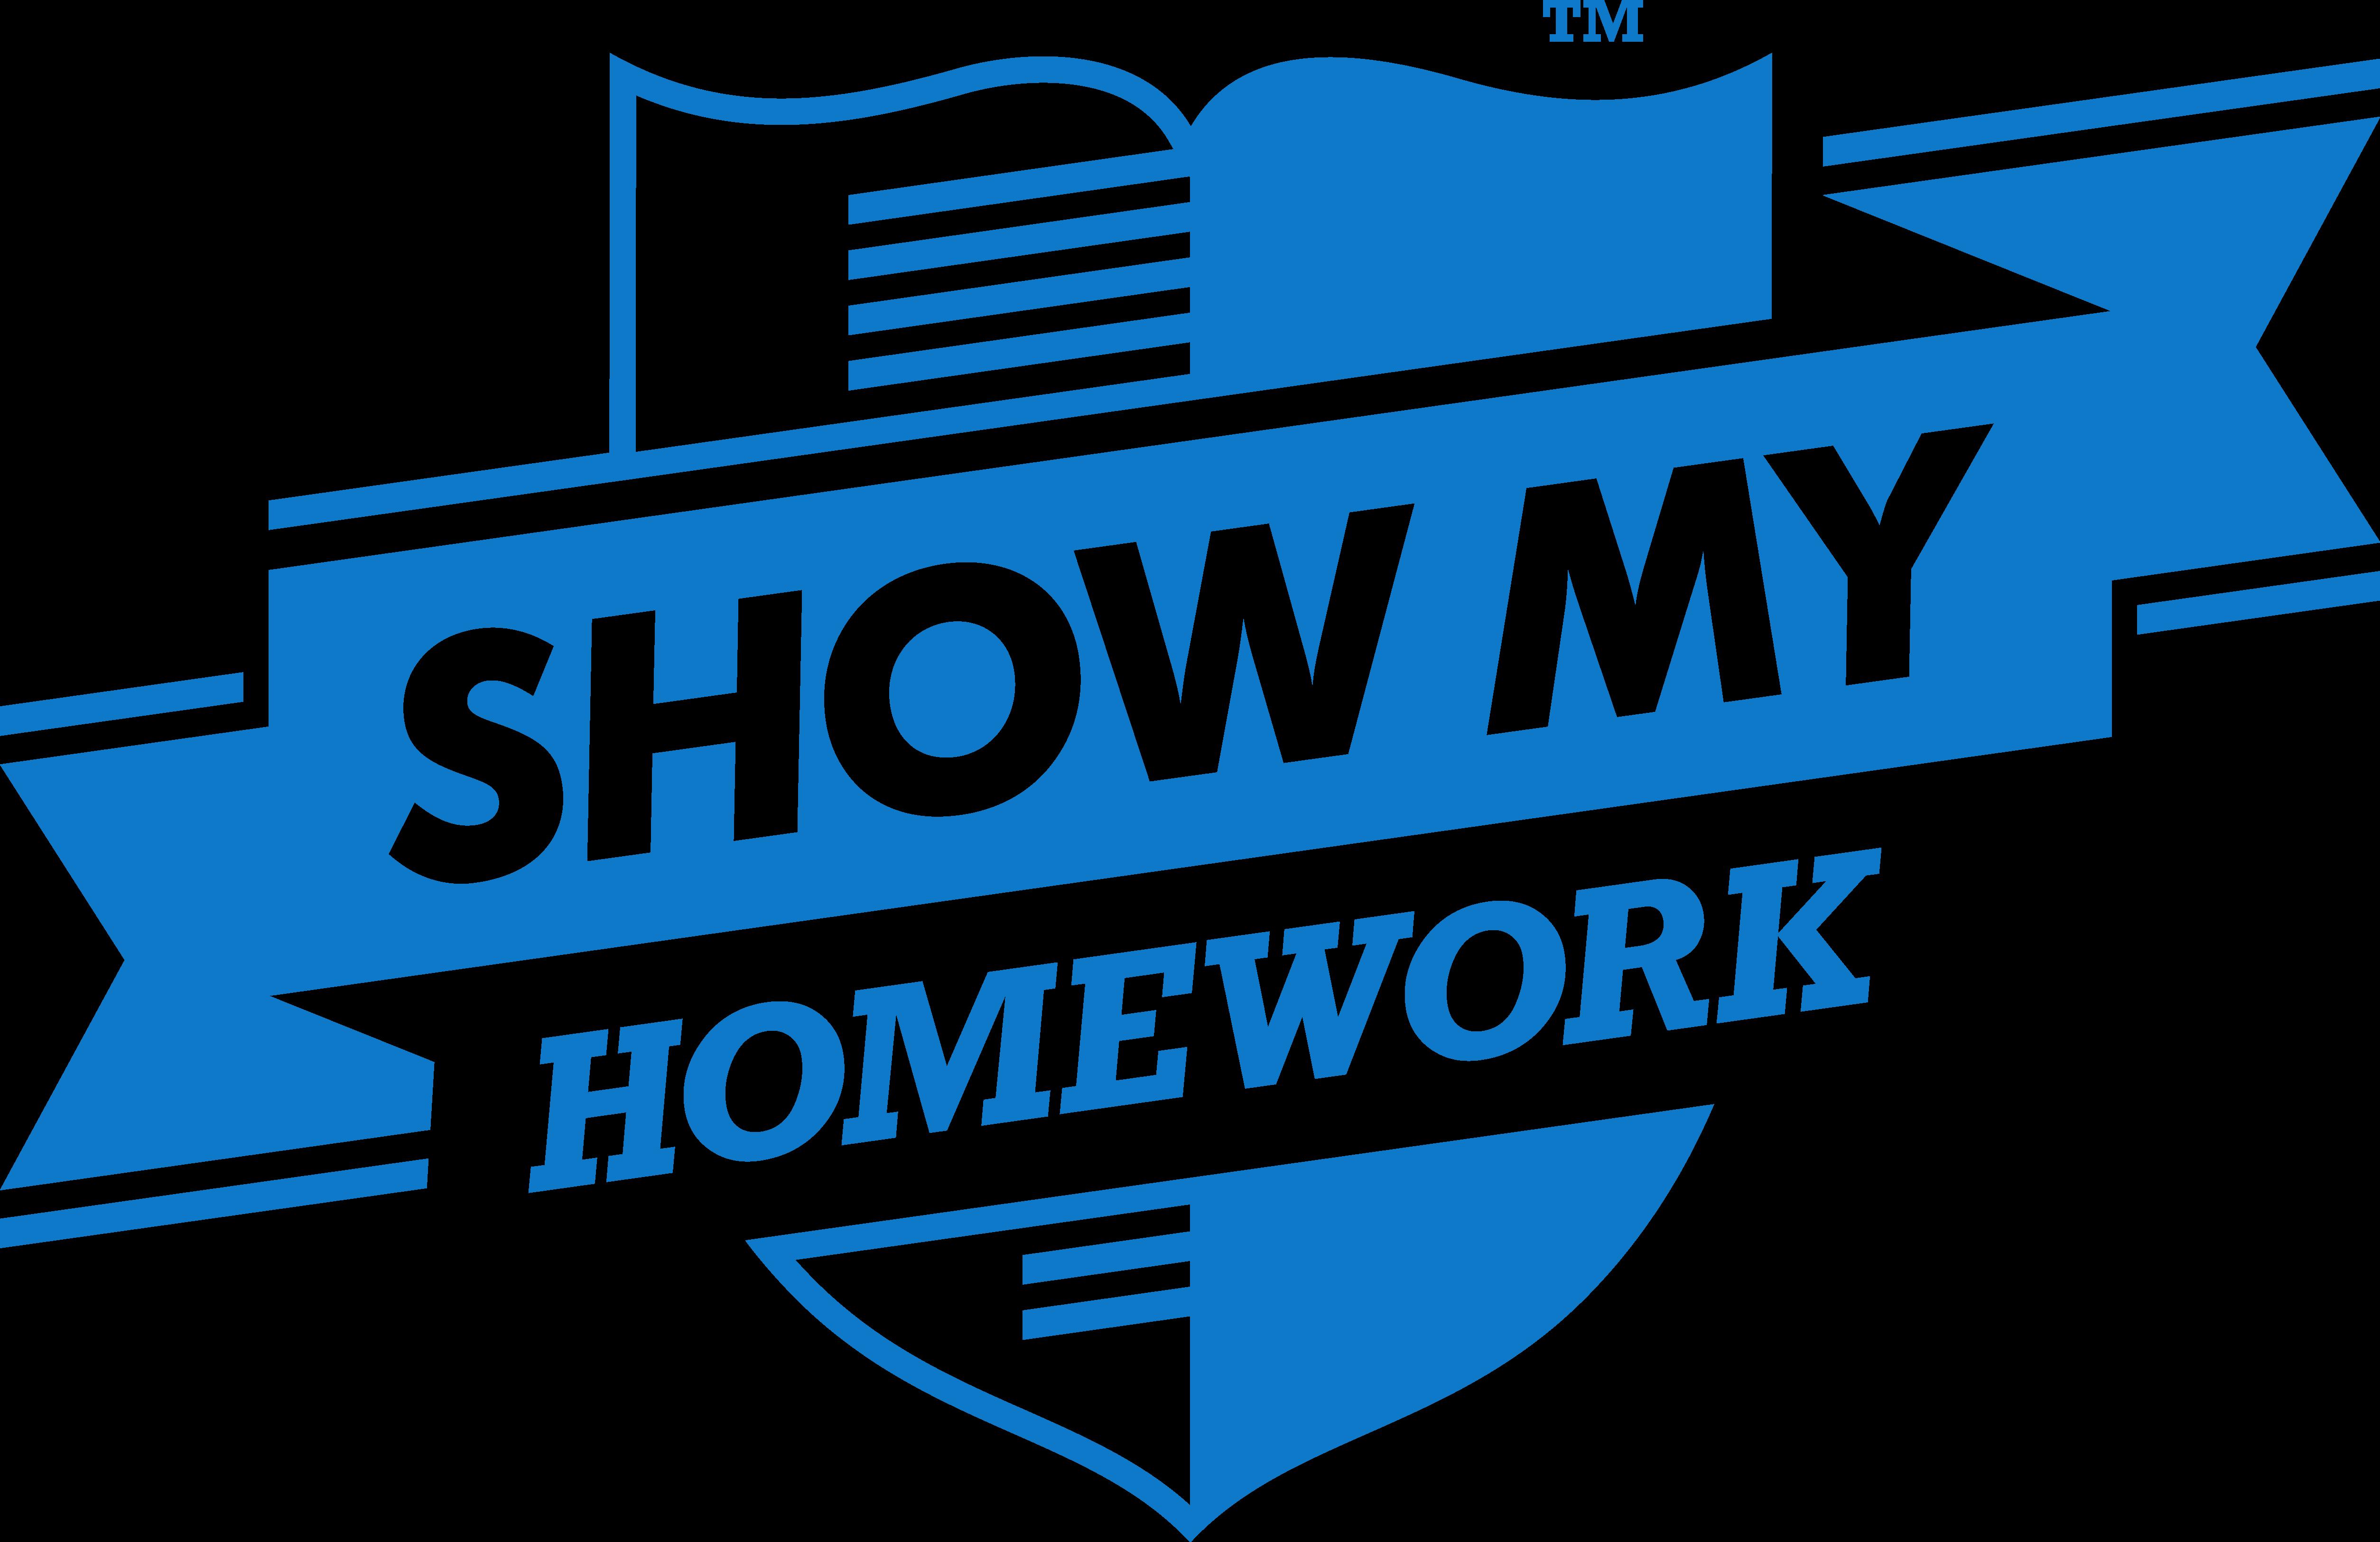 SMHW_full_logo_blue-1ccf67b11ca16b92c7d8162d5a6847ce